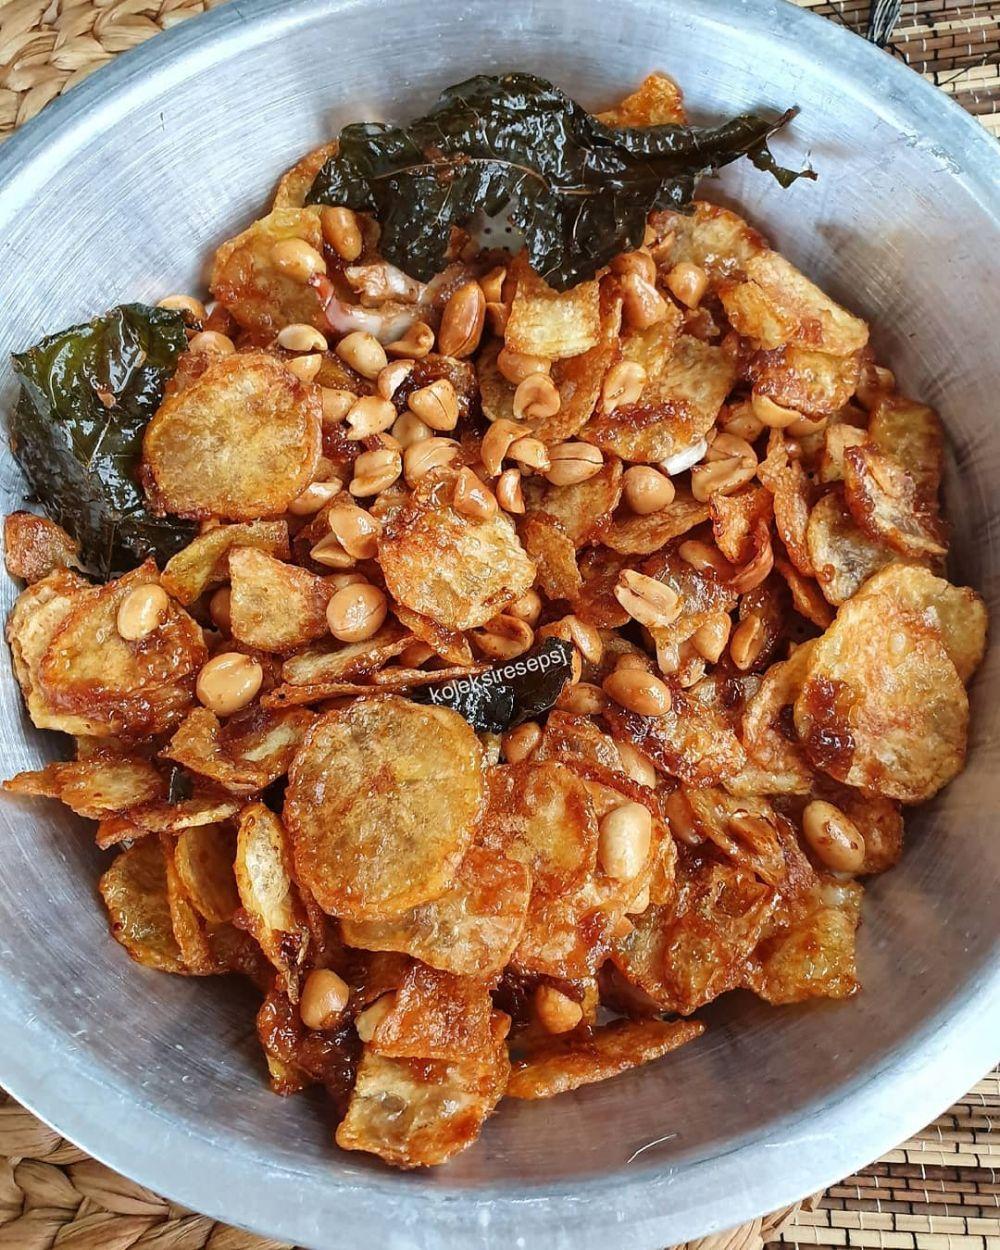 17 Resep Masakan Lebaran C 2020 Instagram Nenipuspit Instagram Banususanto Di 2020 Resep Masakan Resep Masakan